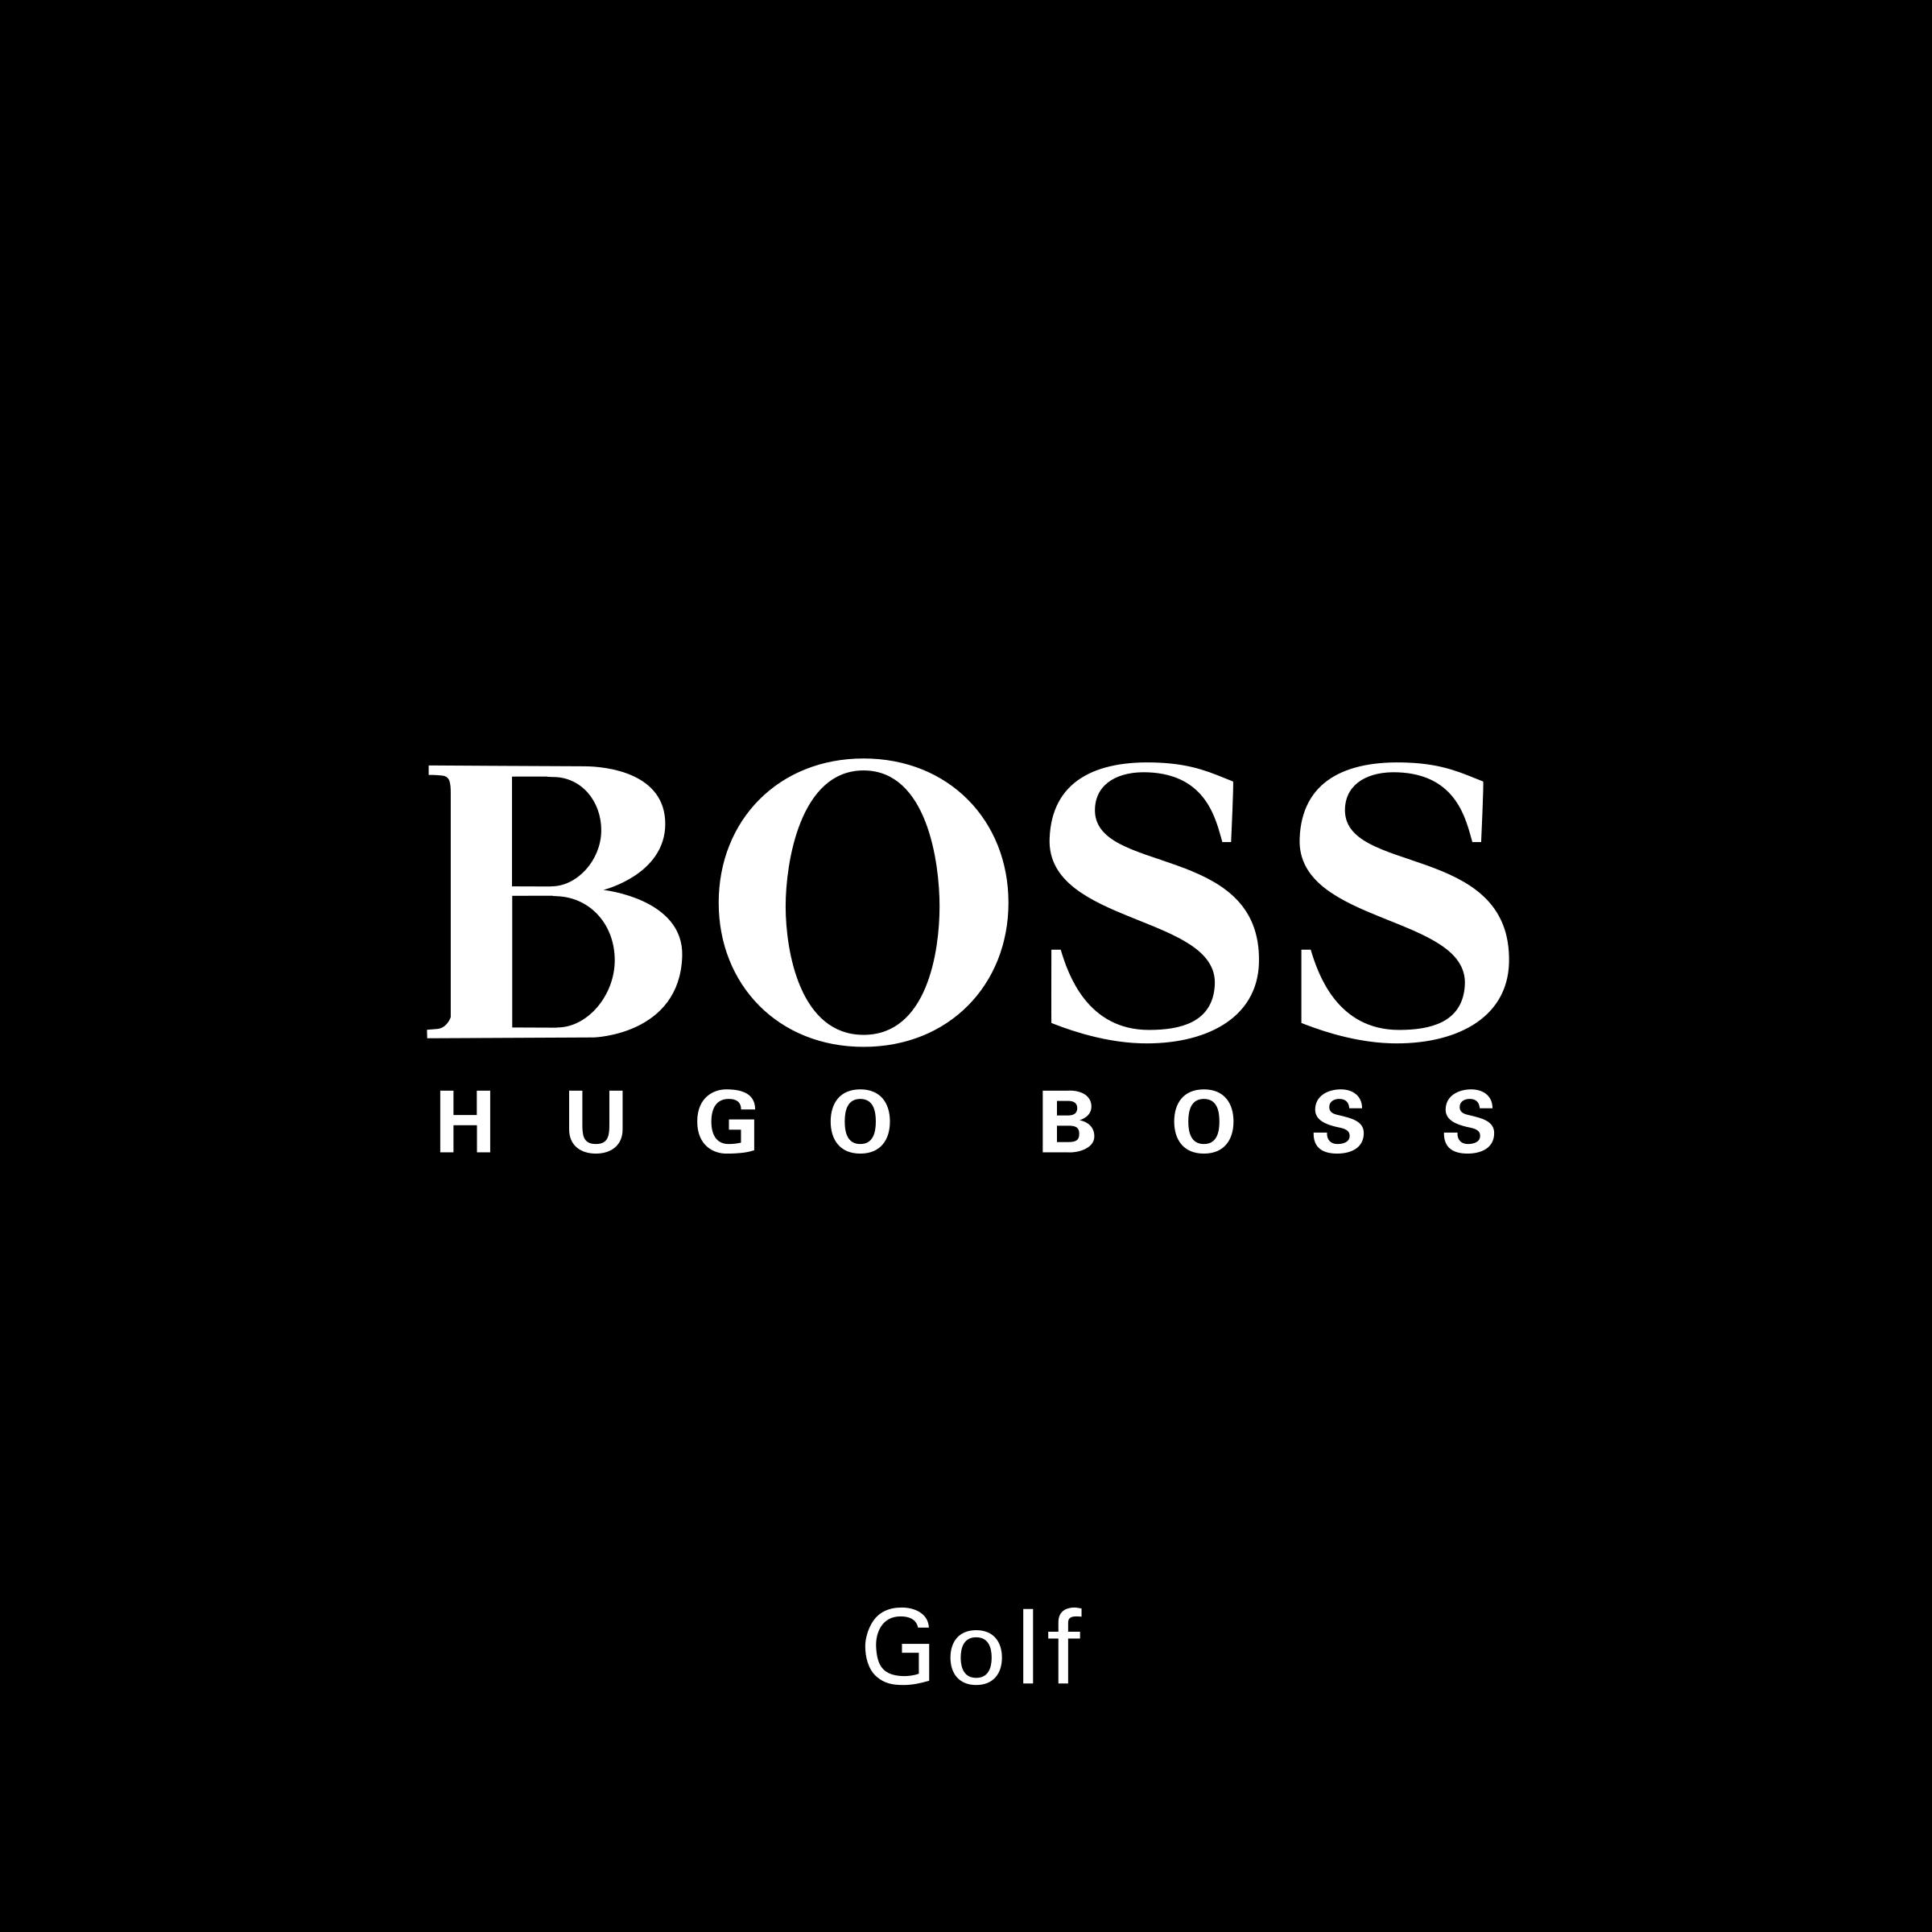 7562c0aaf638 Boss Hugo Boss Golf Logo PNG Transparent & SVG Vector - Freebie Supply